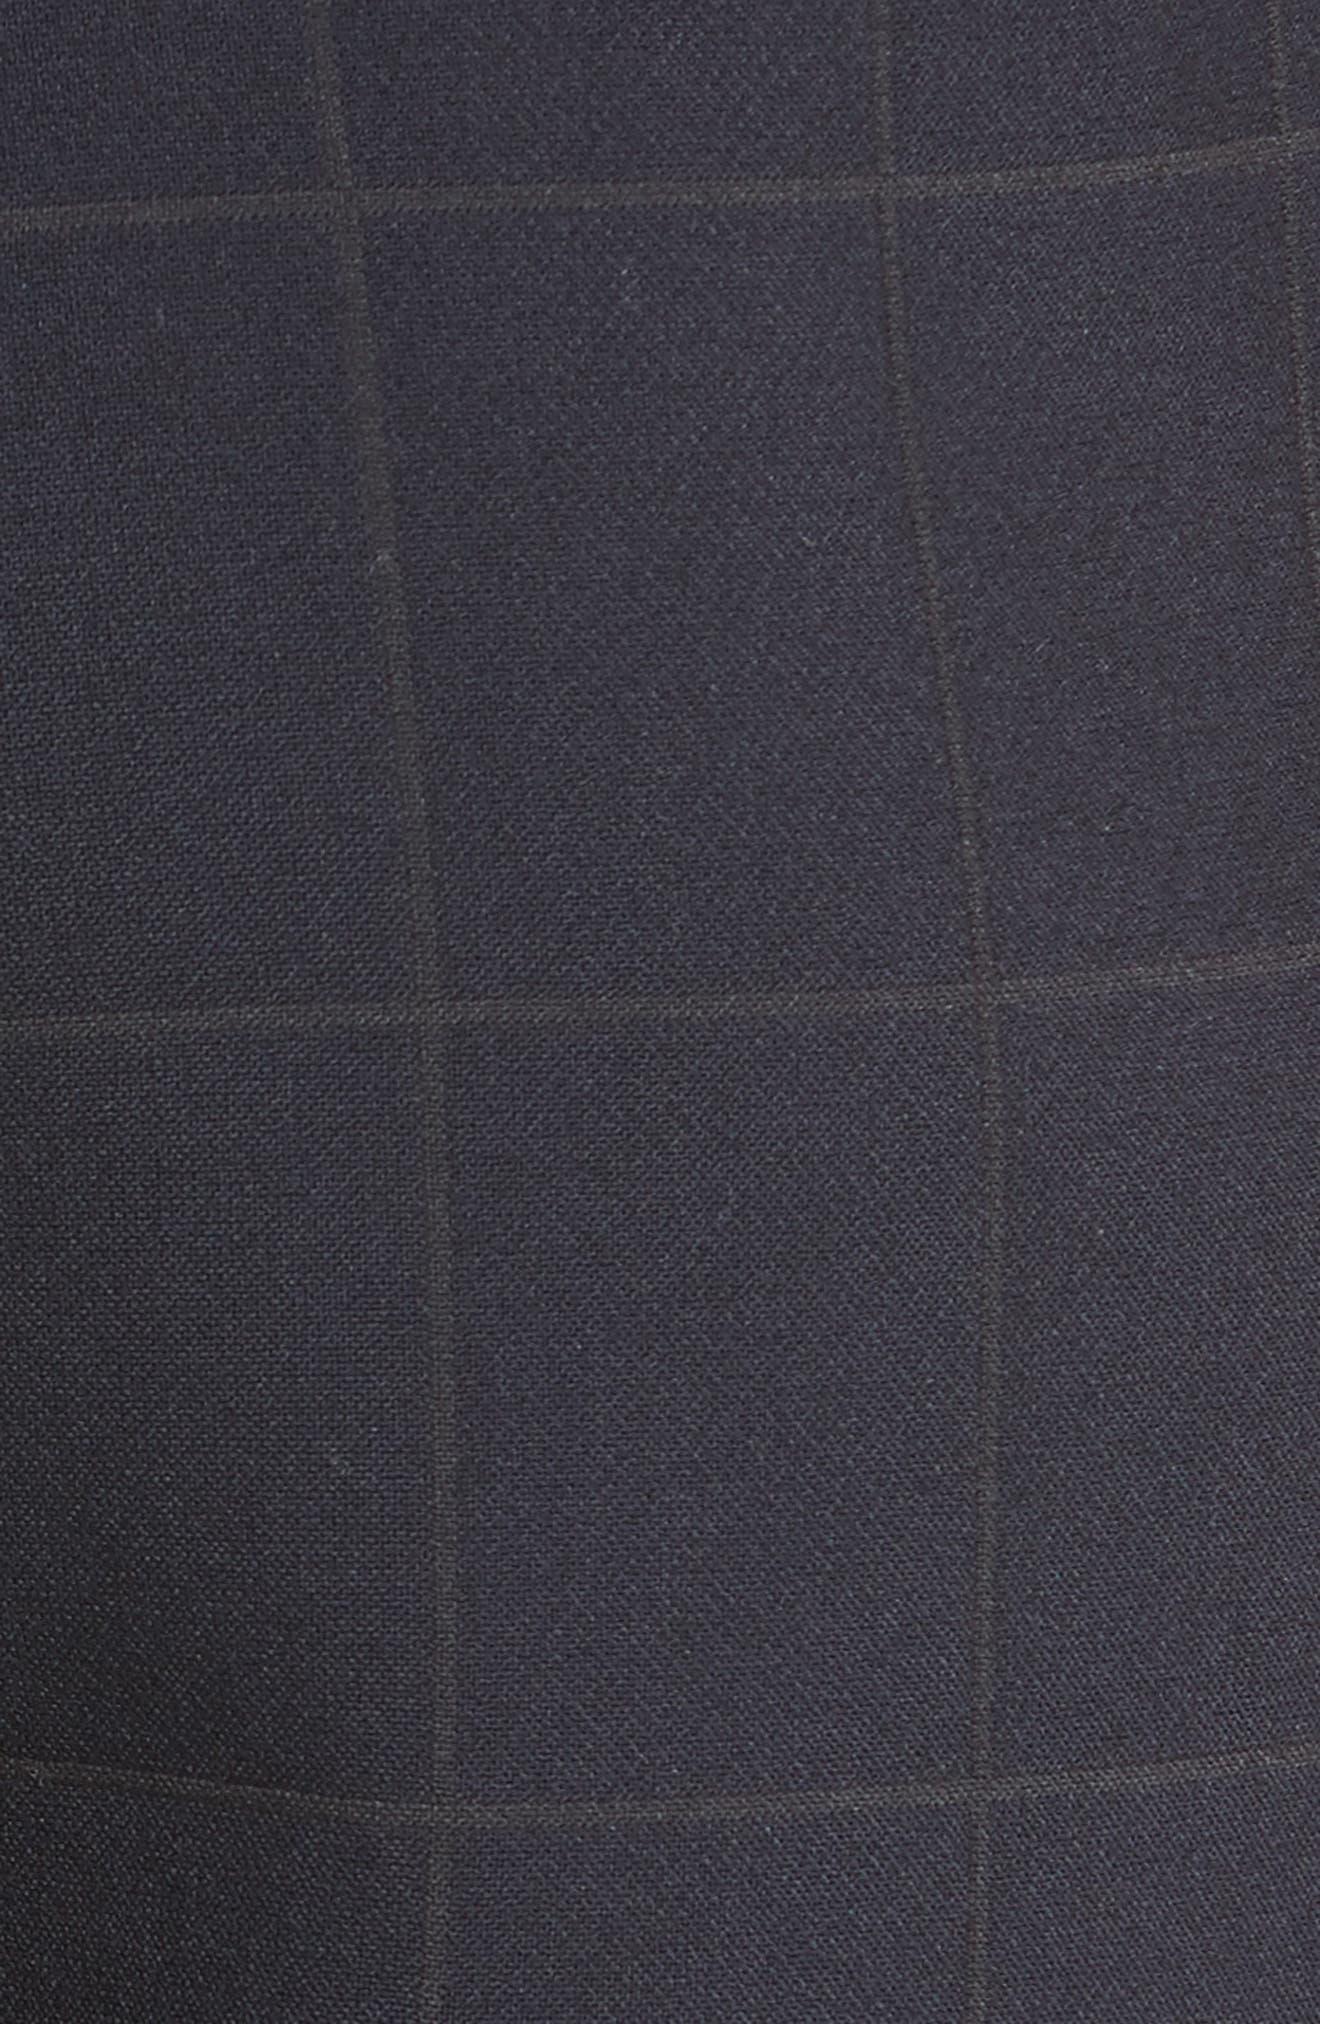 Alternate Image 3  - Armani Collezioni Windowpane Plaid Pants